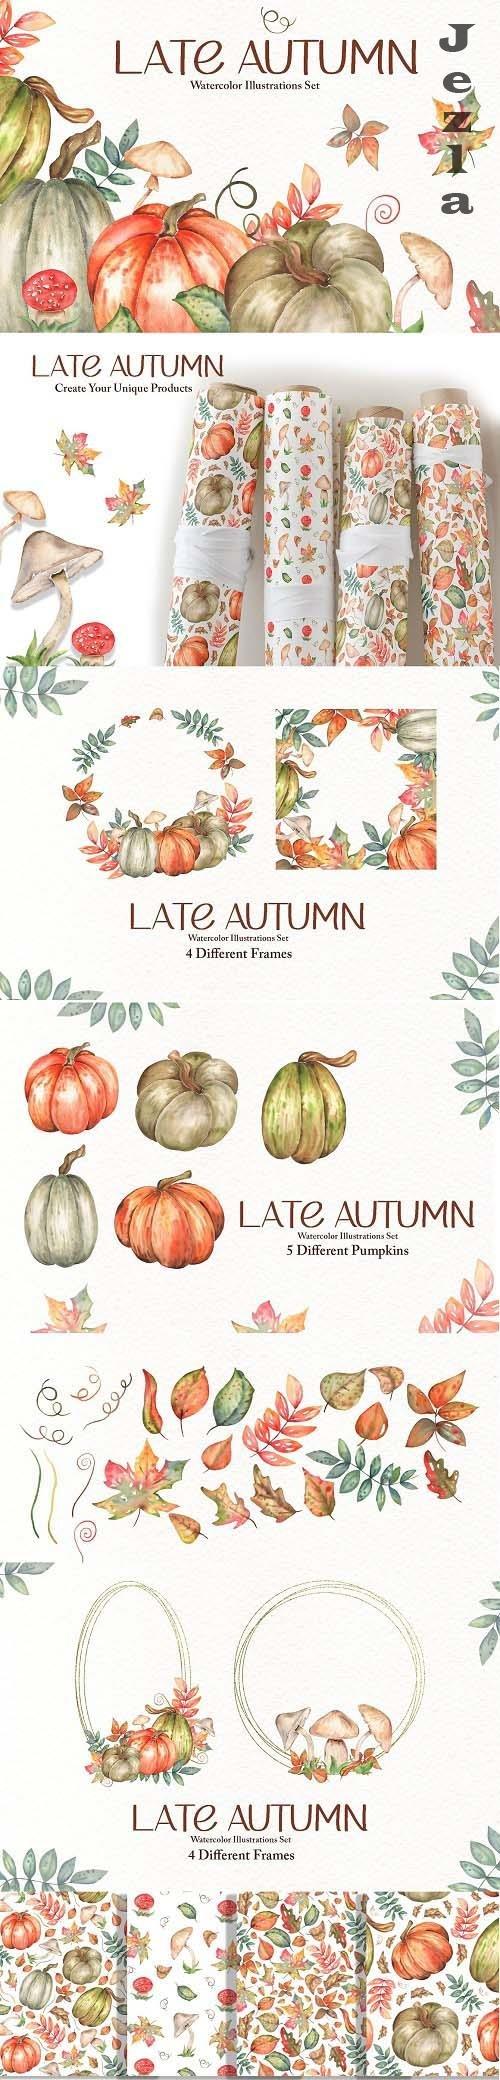 Late Autumn Watercolor Set - 6575931